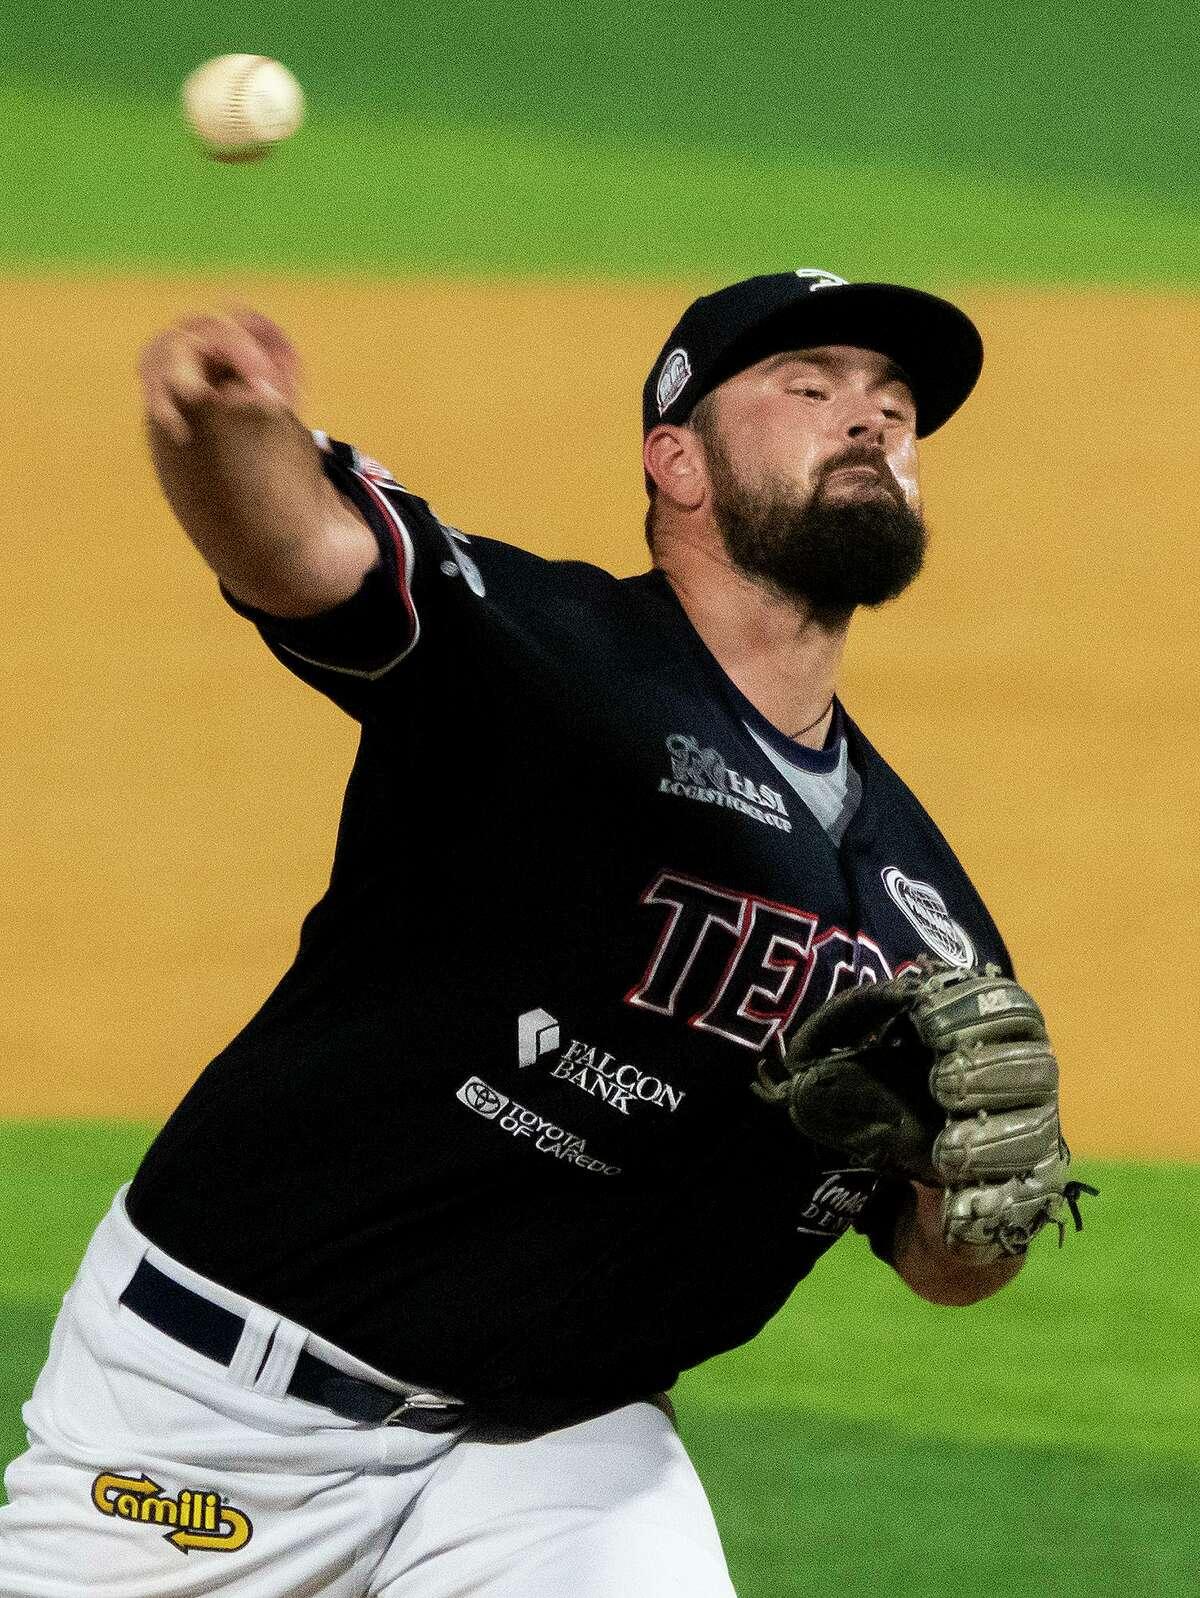 Starting pitcher Jackson Stephens recorded 11 strikeouts as the Tecolotes Dos Laredos blanked the Rieleros de Aguascalientes on Wednesday.